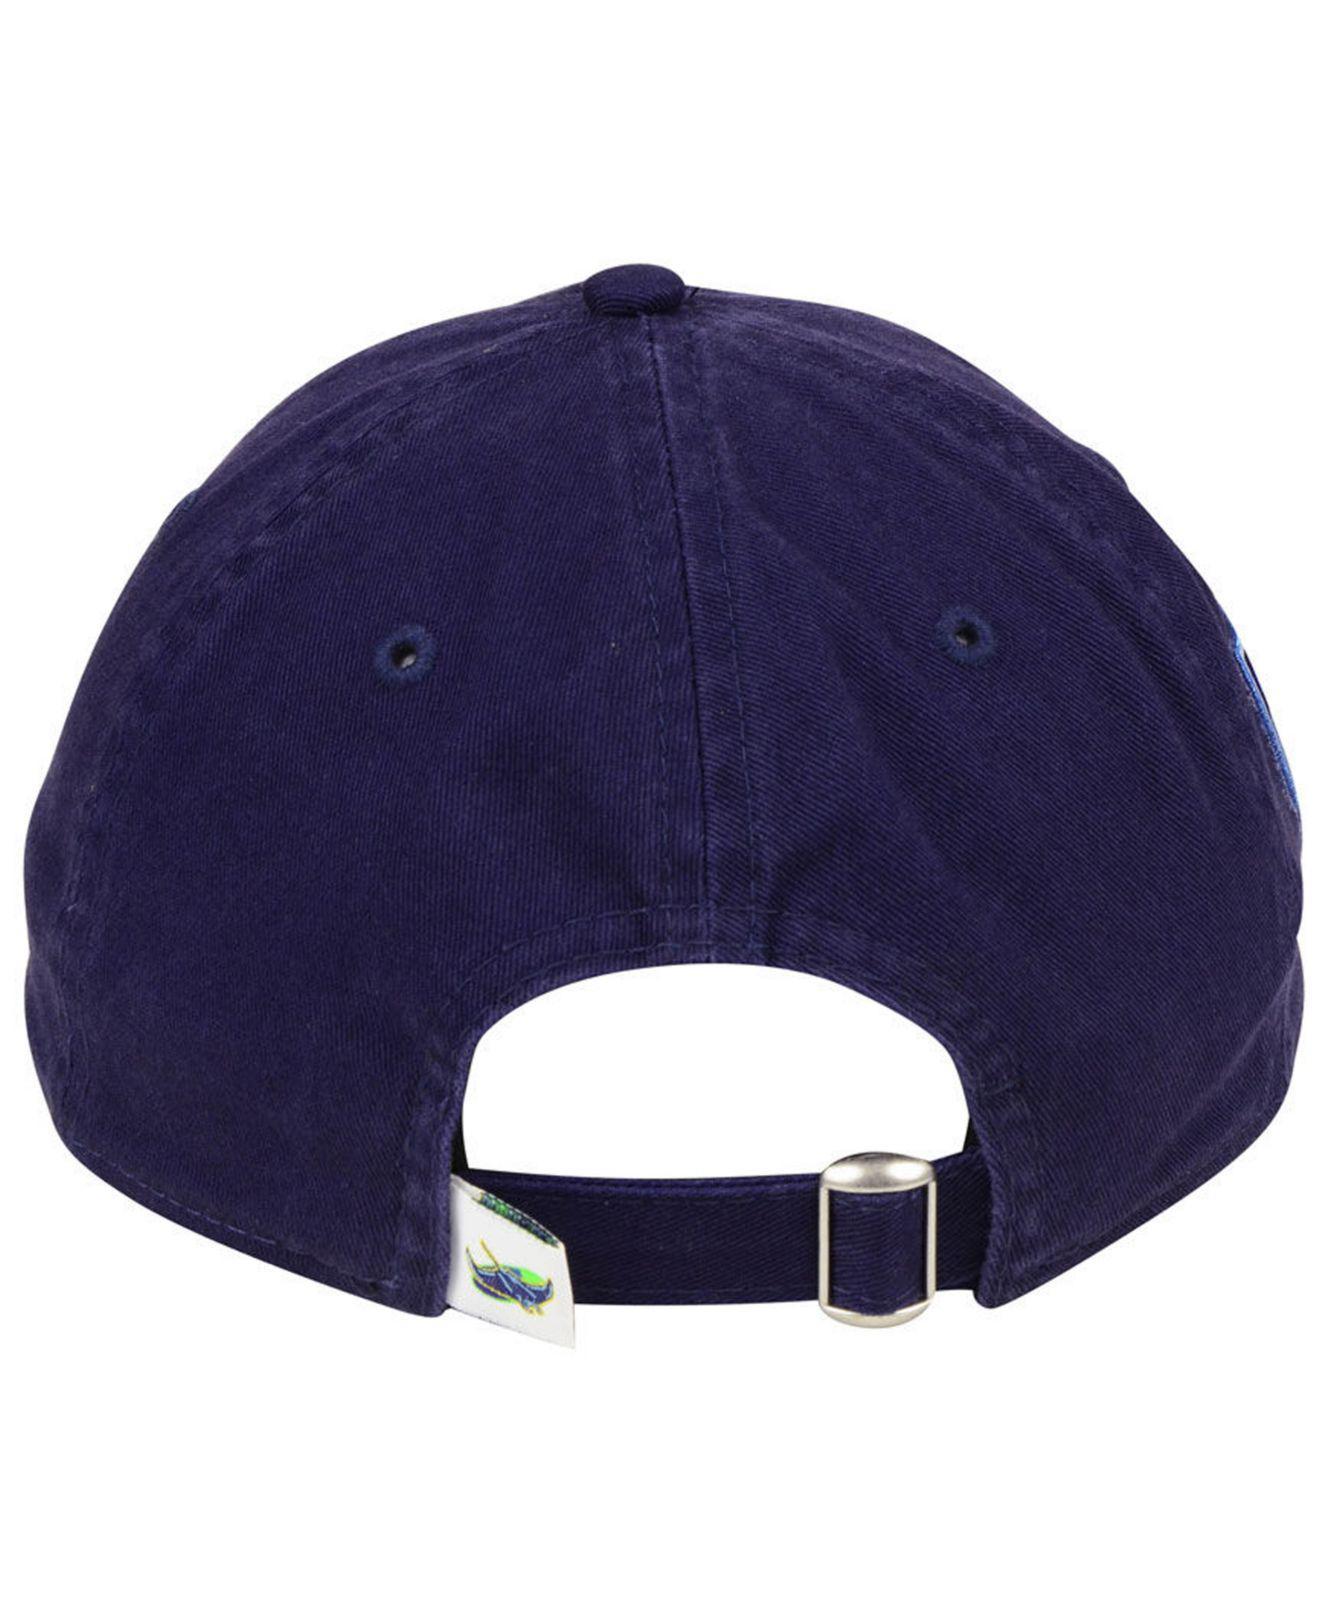 new product 20bec 0a7bb ... germany tampa bay rays core classic 20th anniversary 9twenty cap for  men lyst. view fullscreen